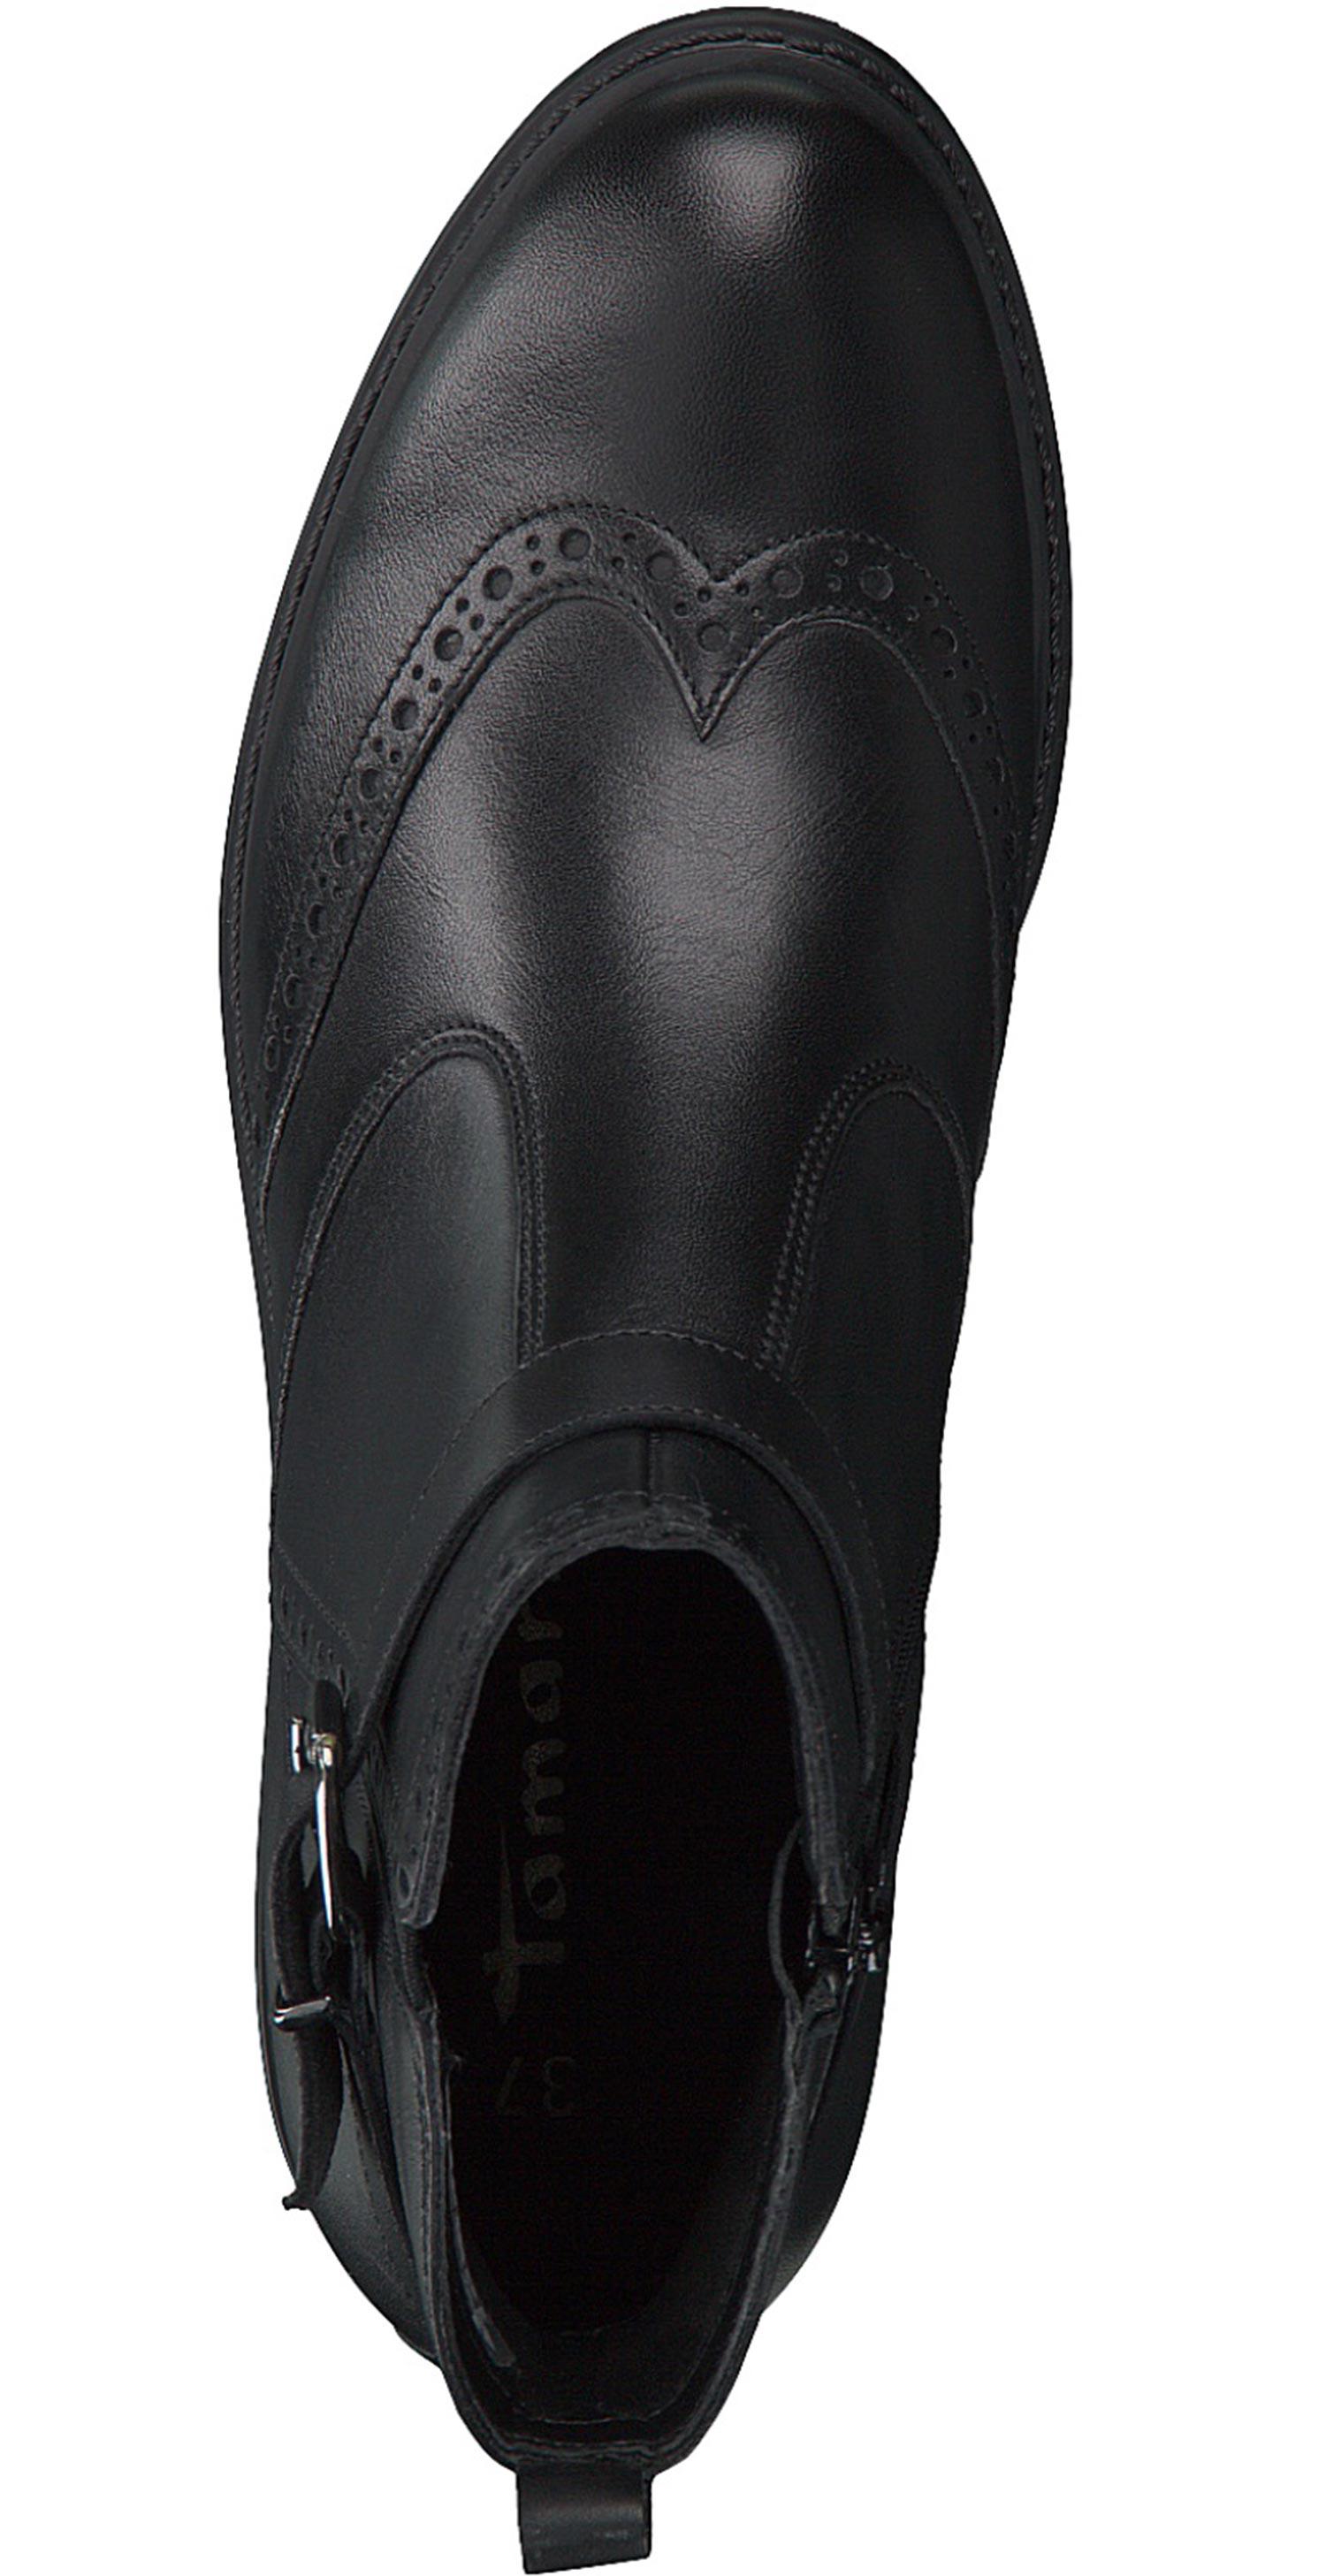 Tamaris-Women-039-s-Boots-Ankle-Boots-Winter-25004-21-007-Black-New thumbnail 4